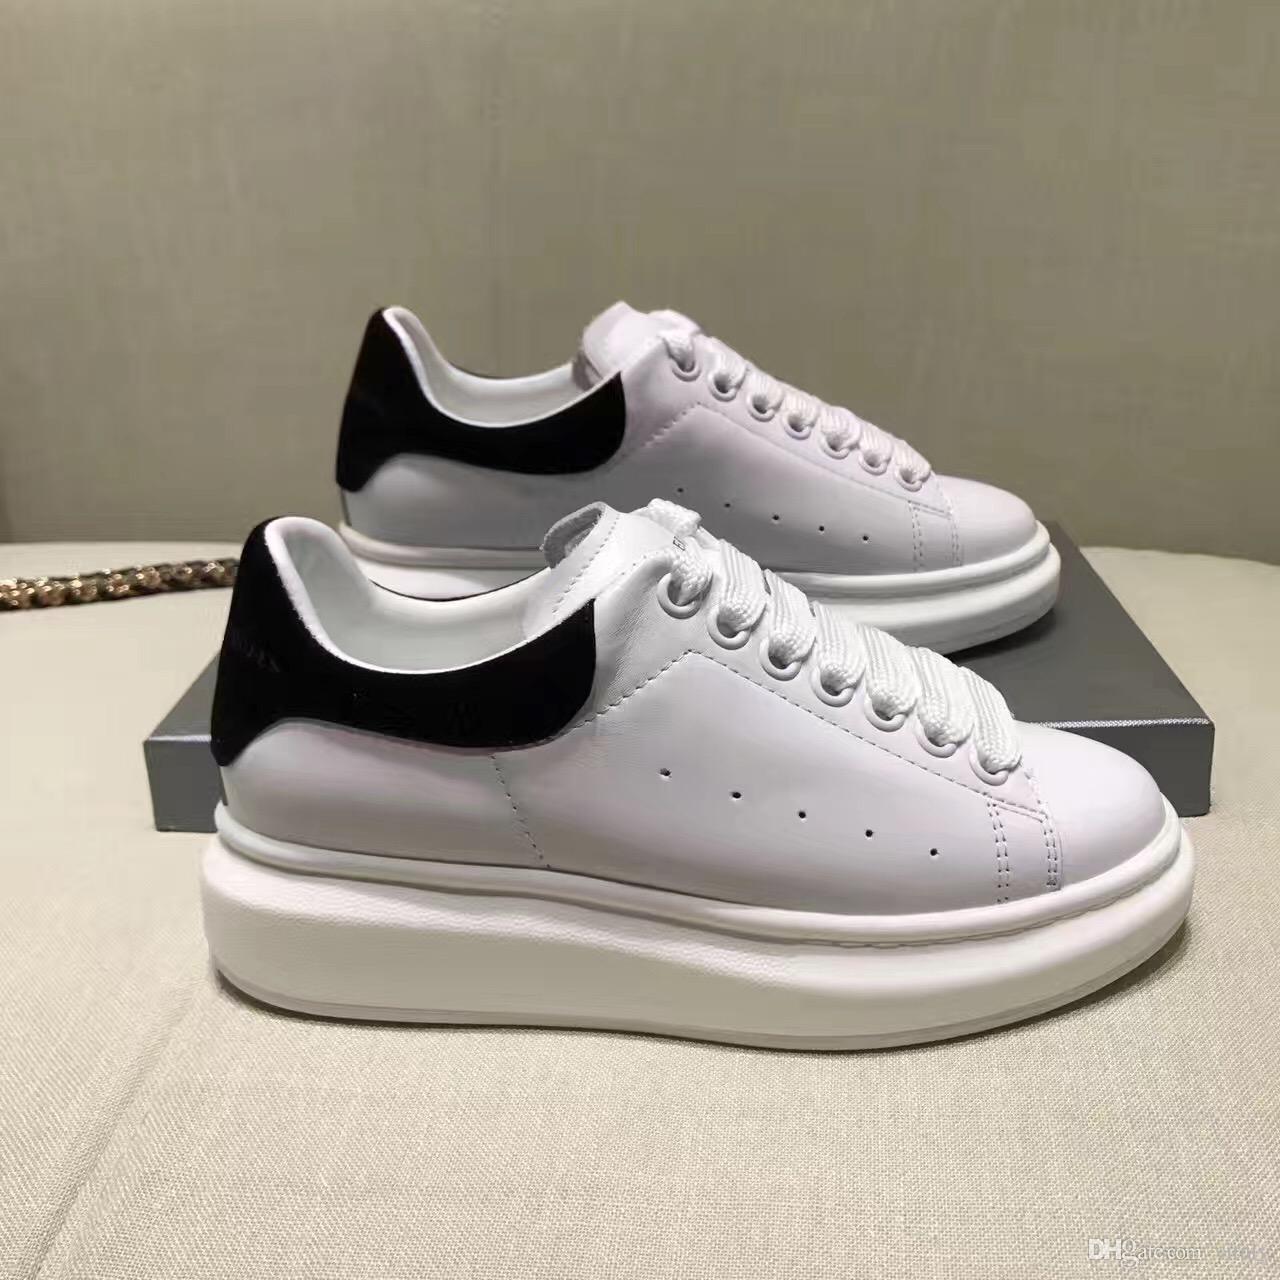 35\u002642 Decorations 7.5 Sneakers Fashion